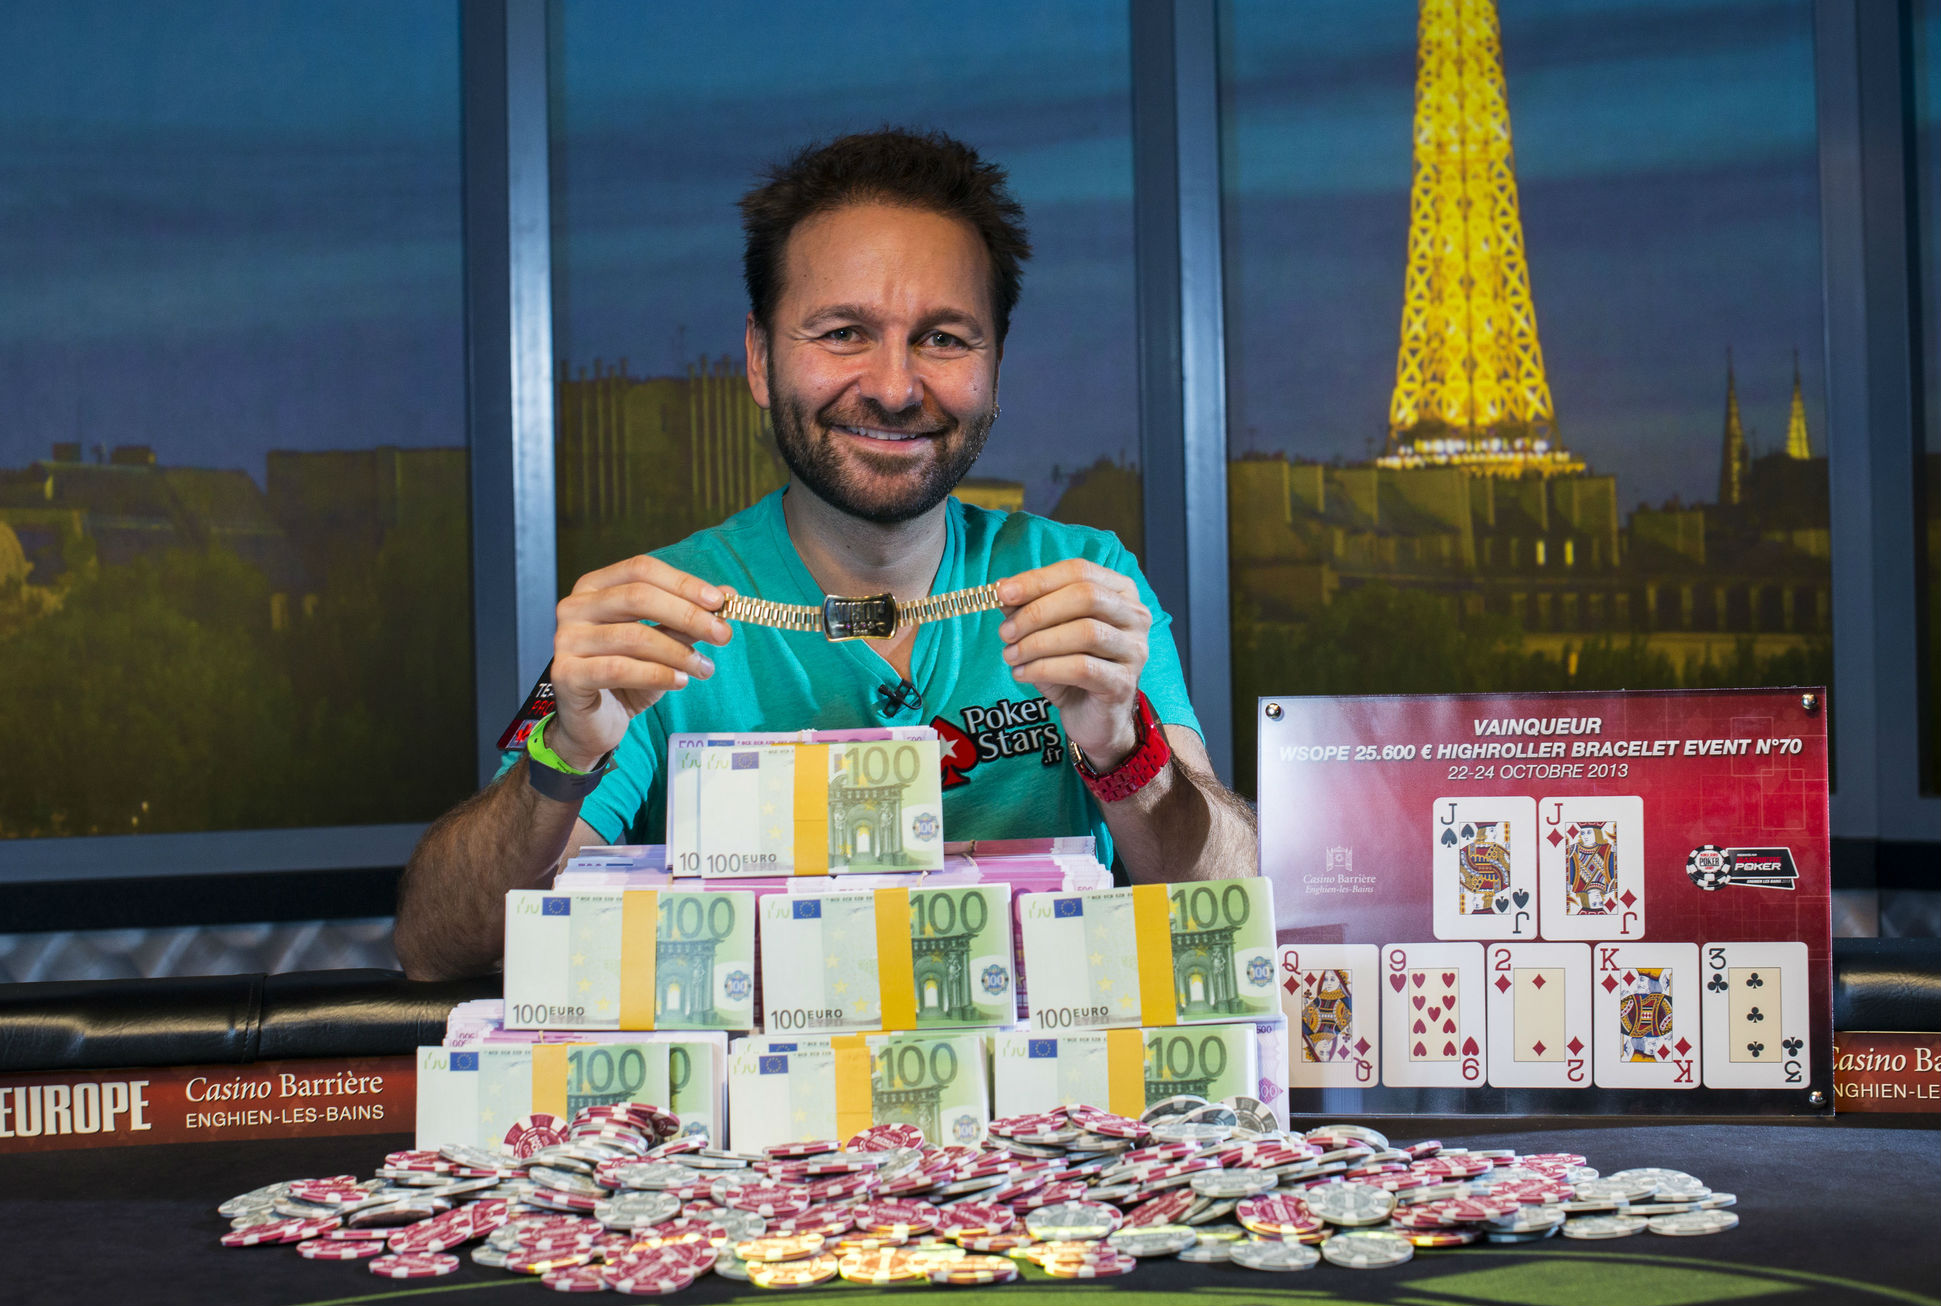 WSOP Top 50: Two-Time WSOP POY Daniel Negreanu Comes in at #6 - PocketFives